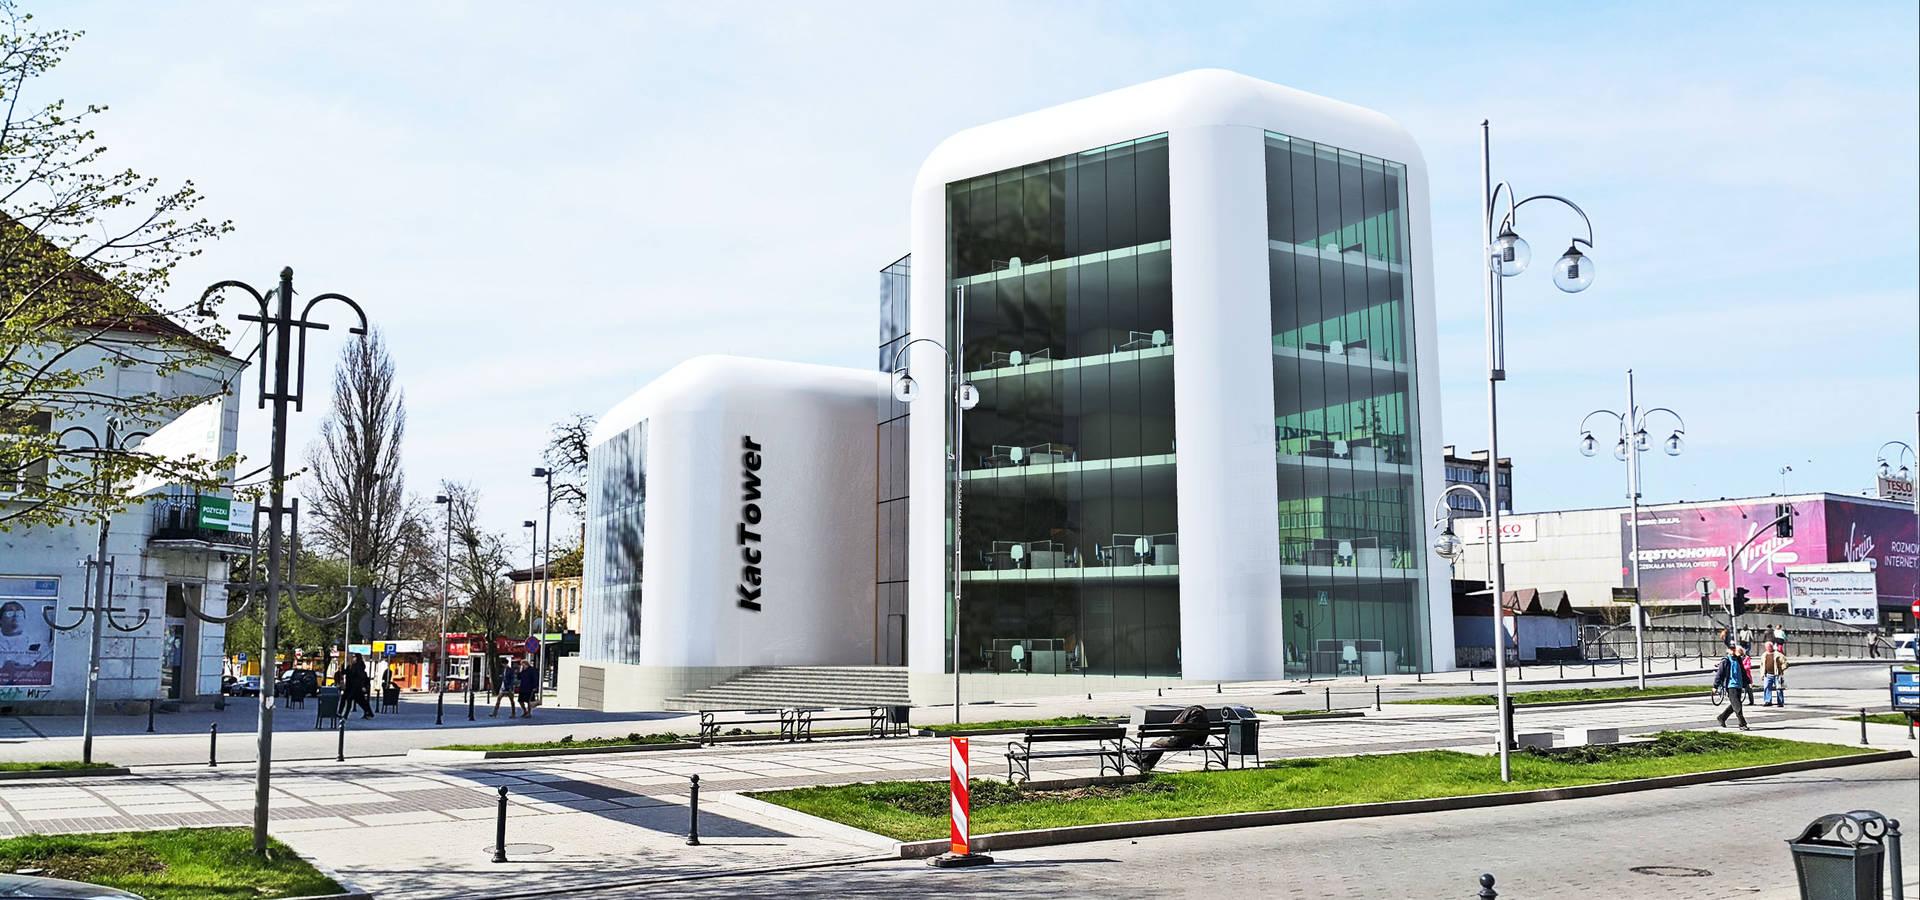 Biuro Architektoniczno-Budowlane s.c.